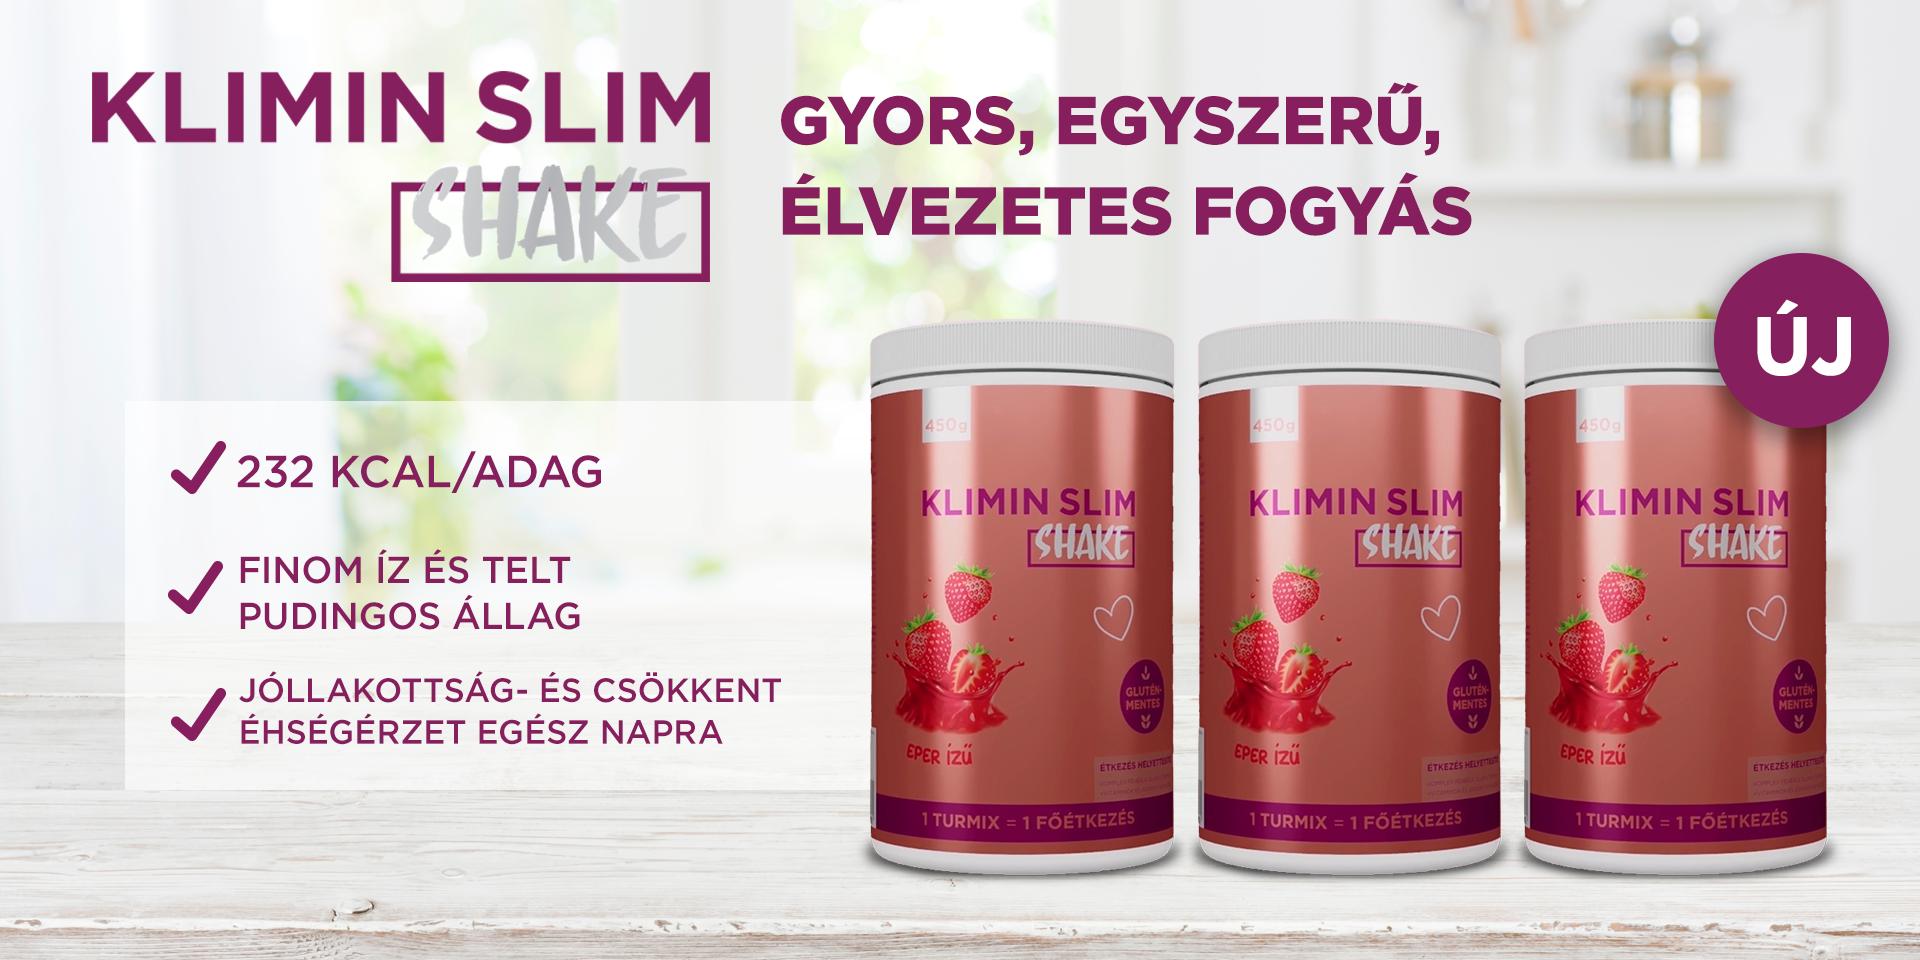 Klimin Slim Shake 2+1 ajándék akció -eper - Pharmax